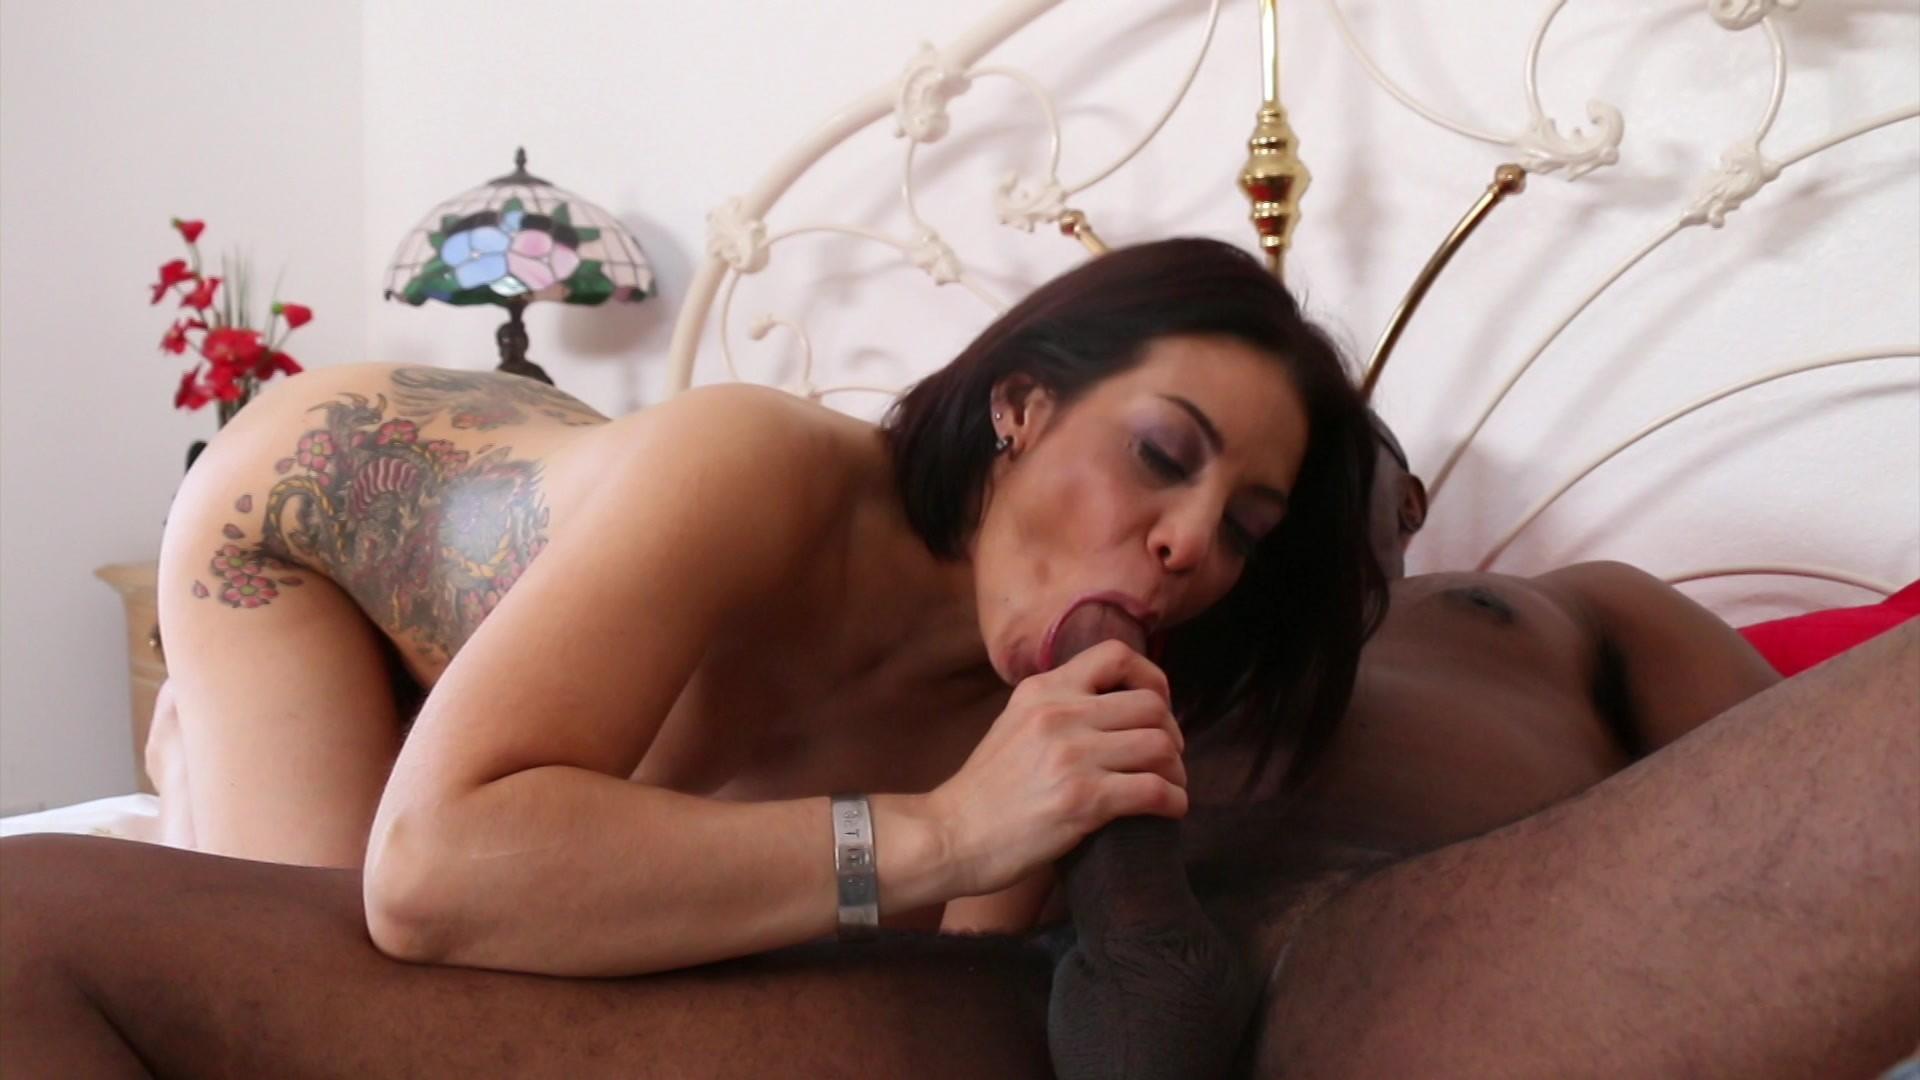 Eroticax couple's porn